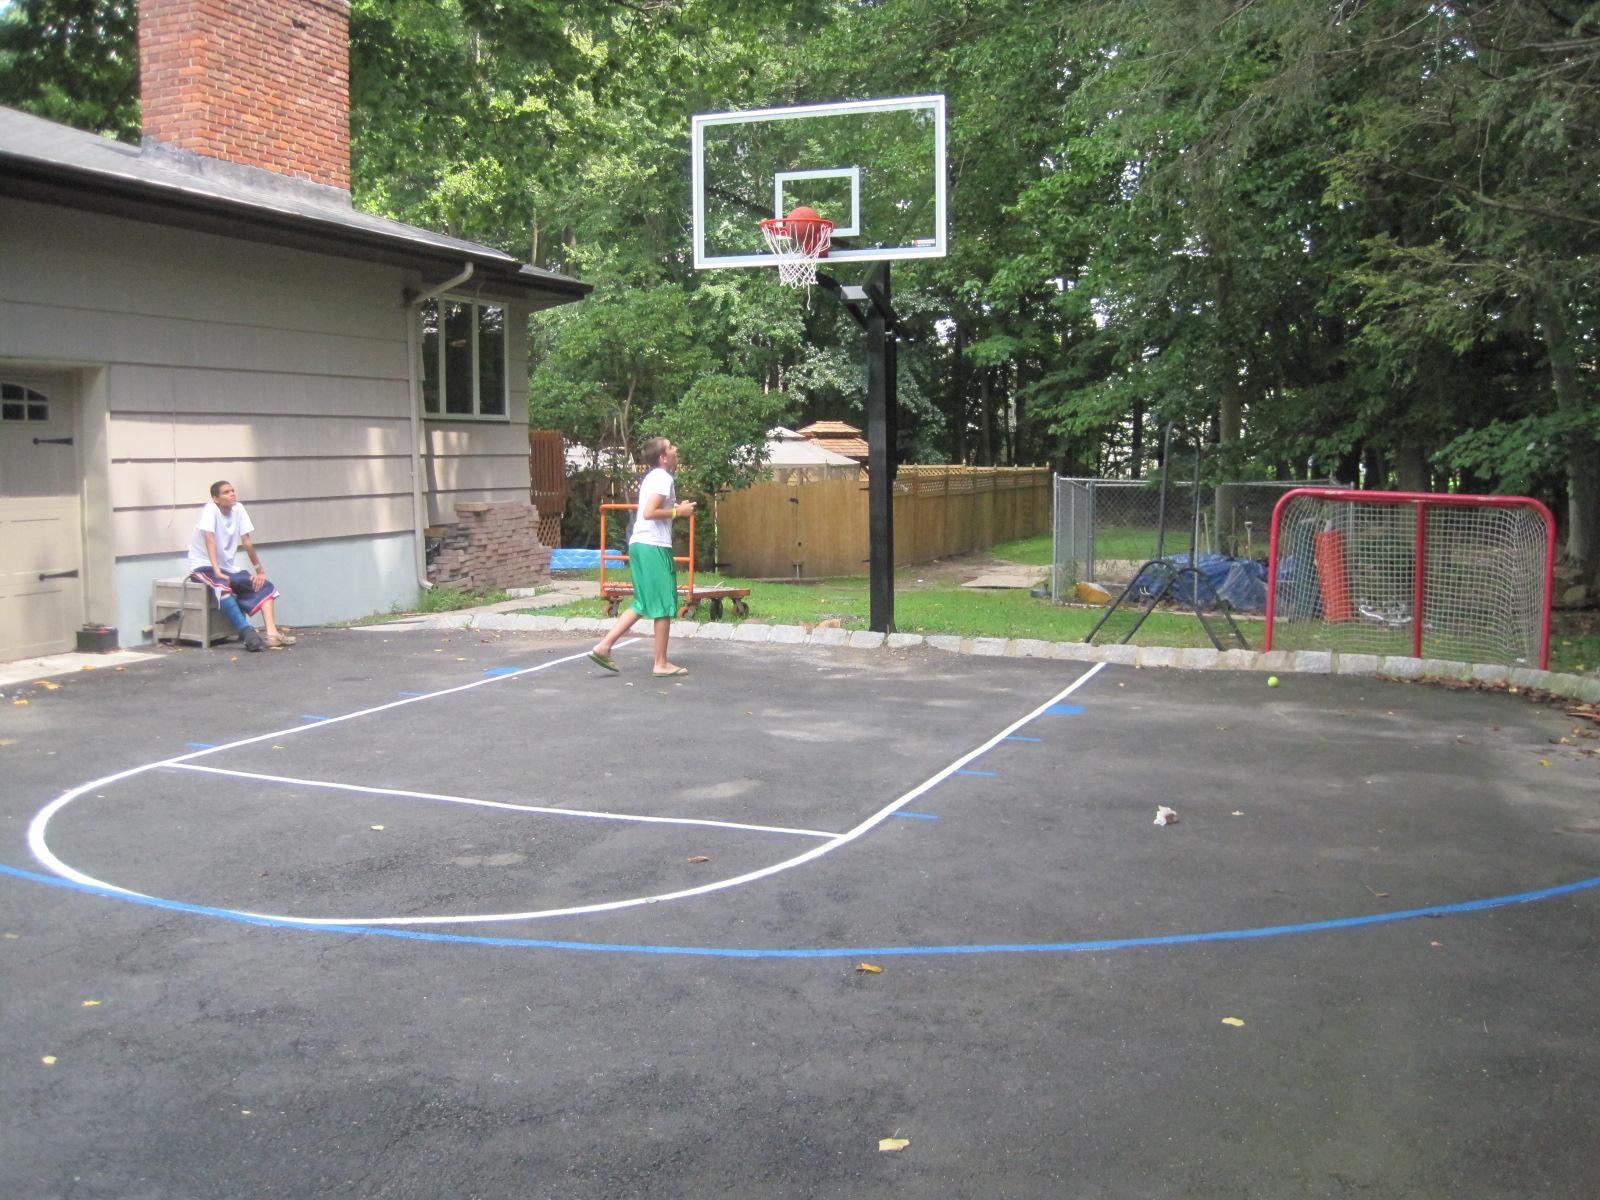 Home Court Hoops - Morristown, NJ